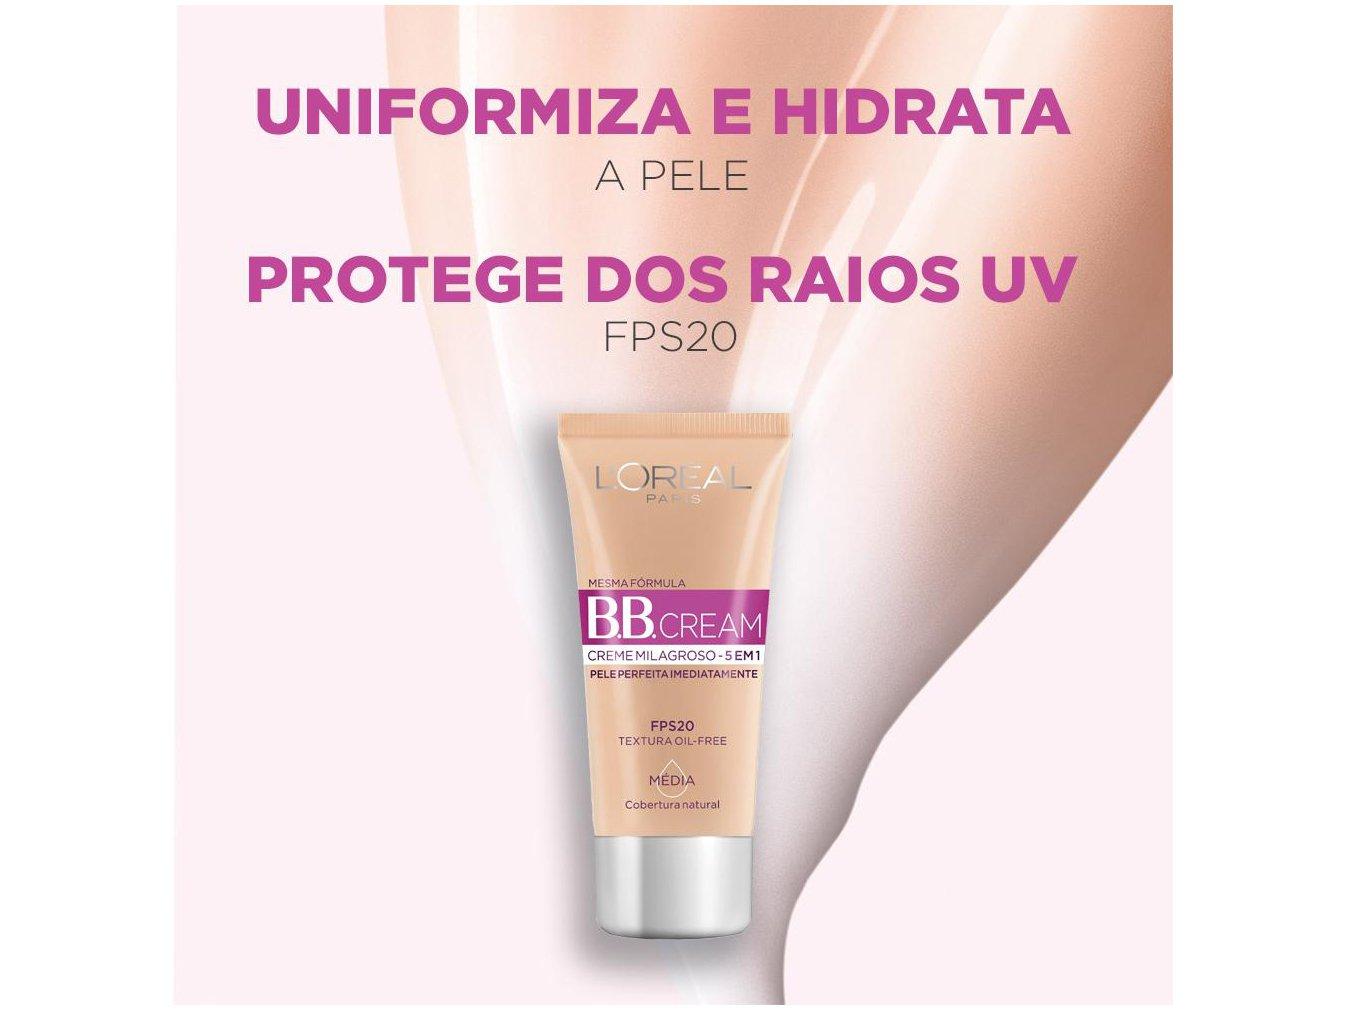 BB Cream L'Oréal Paris cor Clara FPS 20 30ml - 4